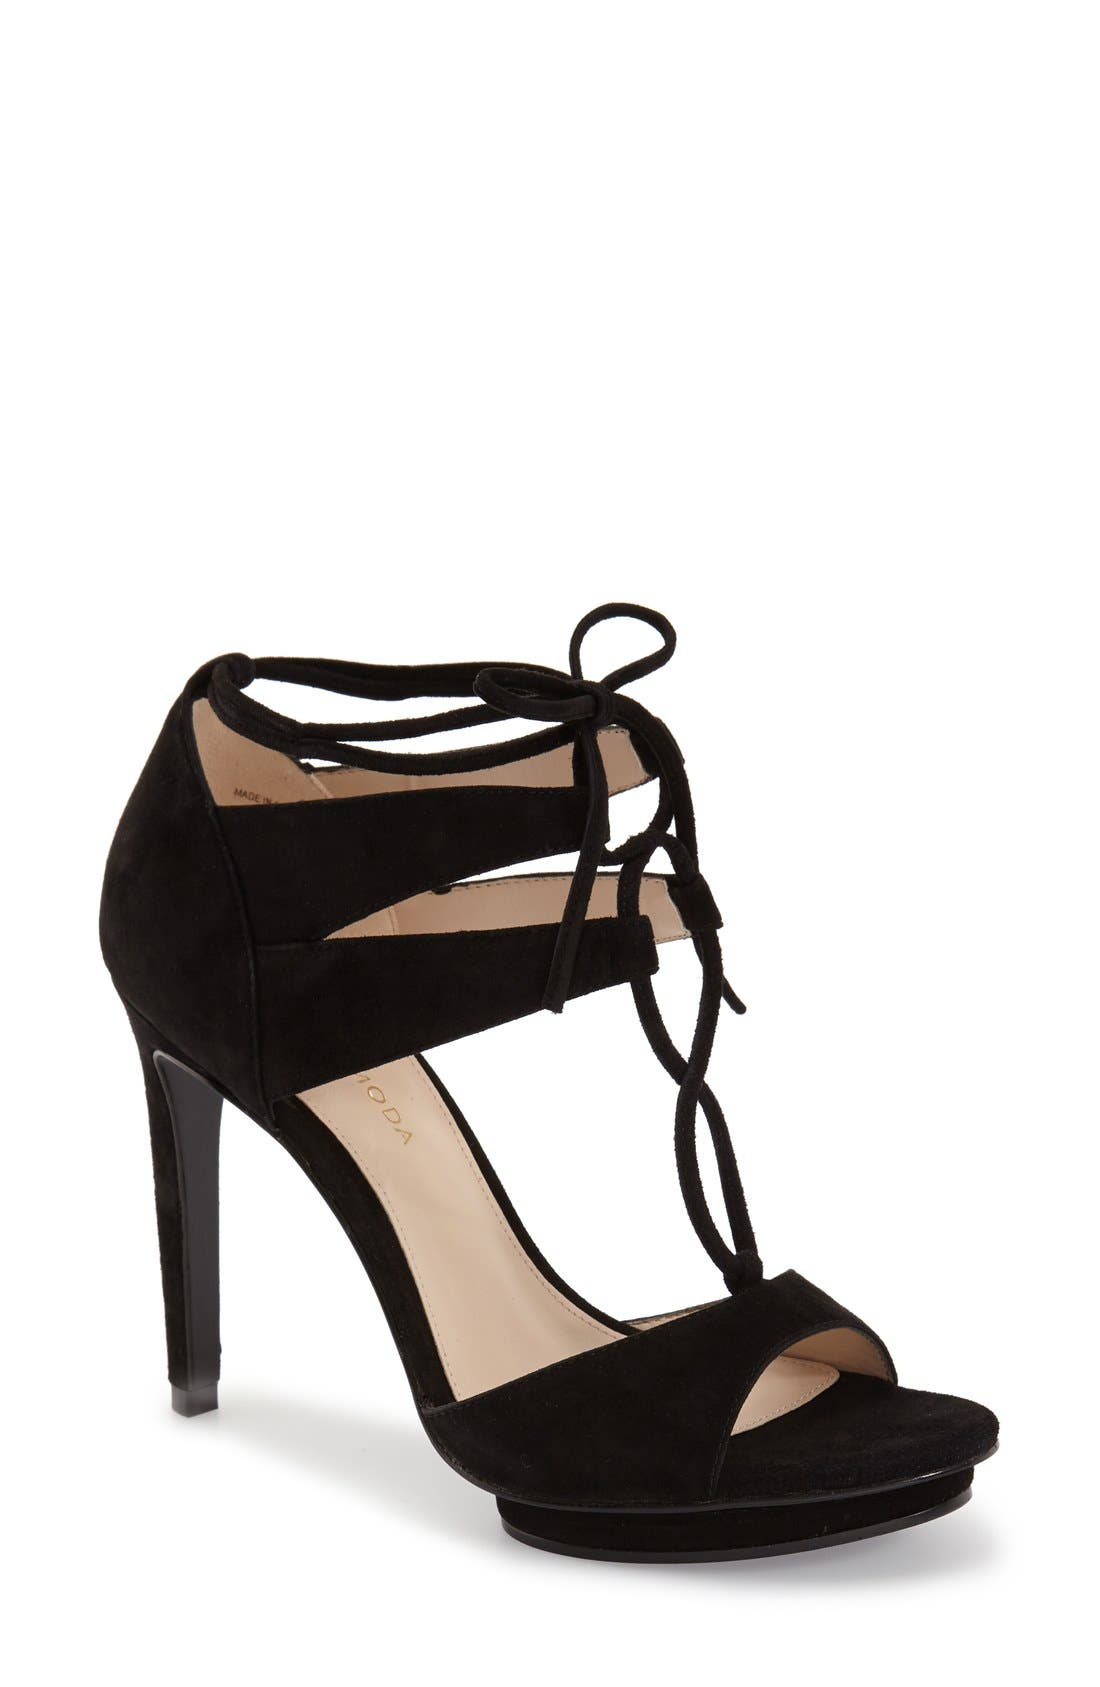 PELLE MODA Talbot Lace-Up Sandal